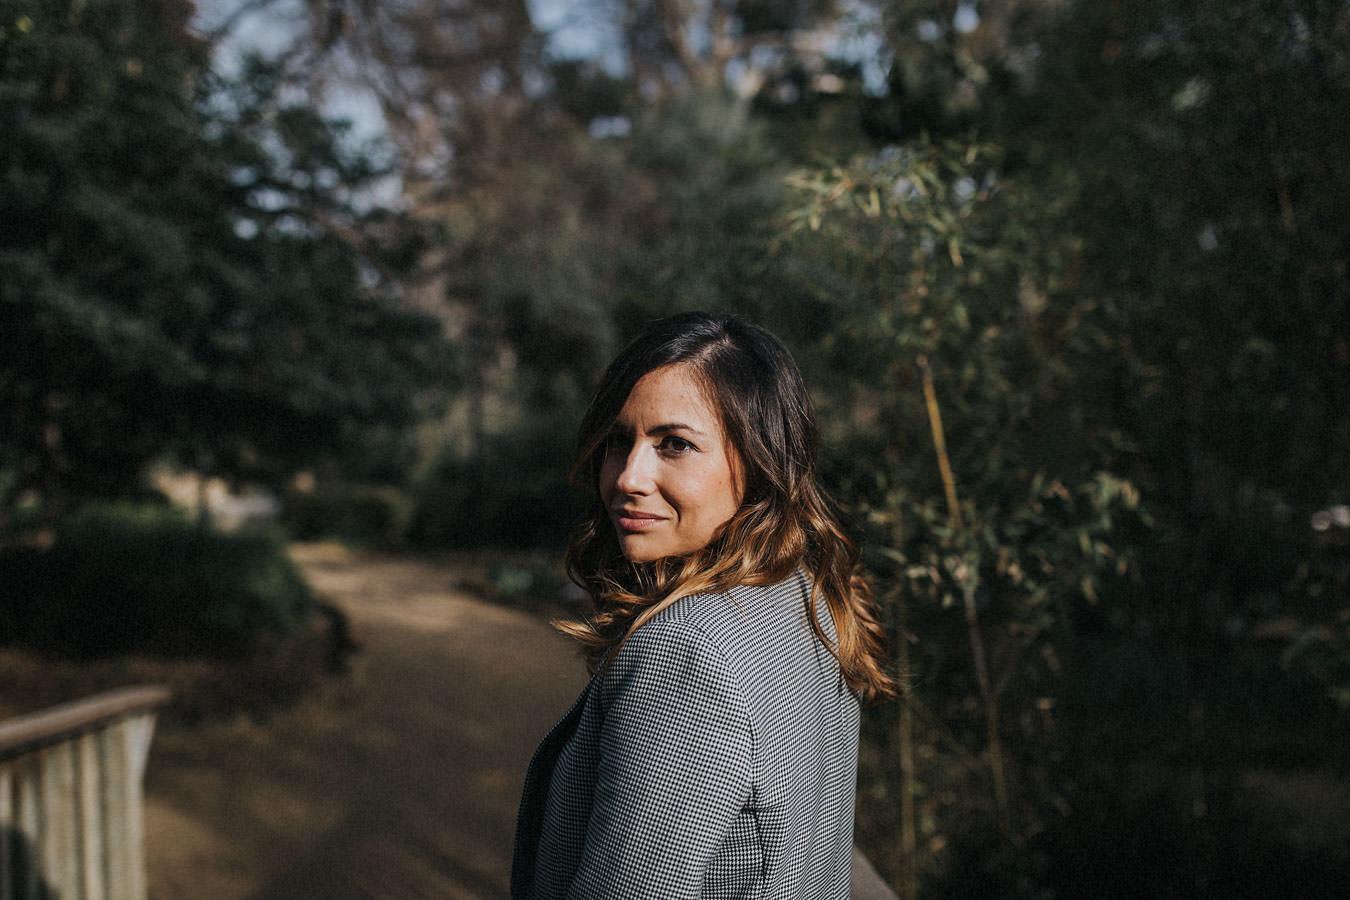 Sesión de fotos romantica en Sevilla